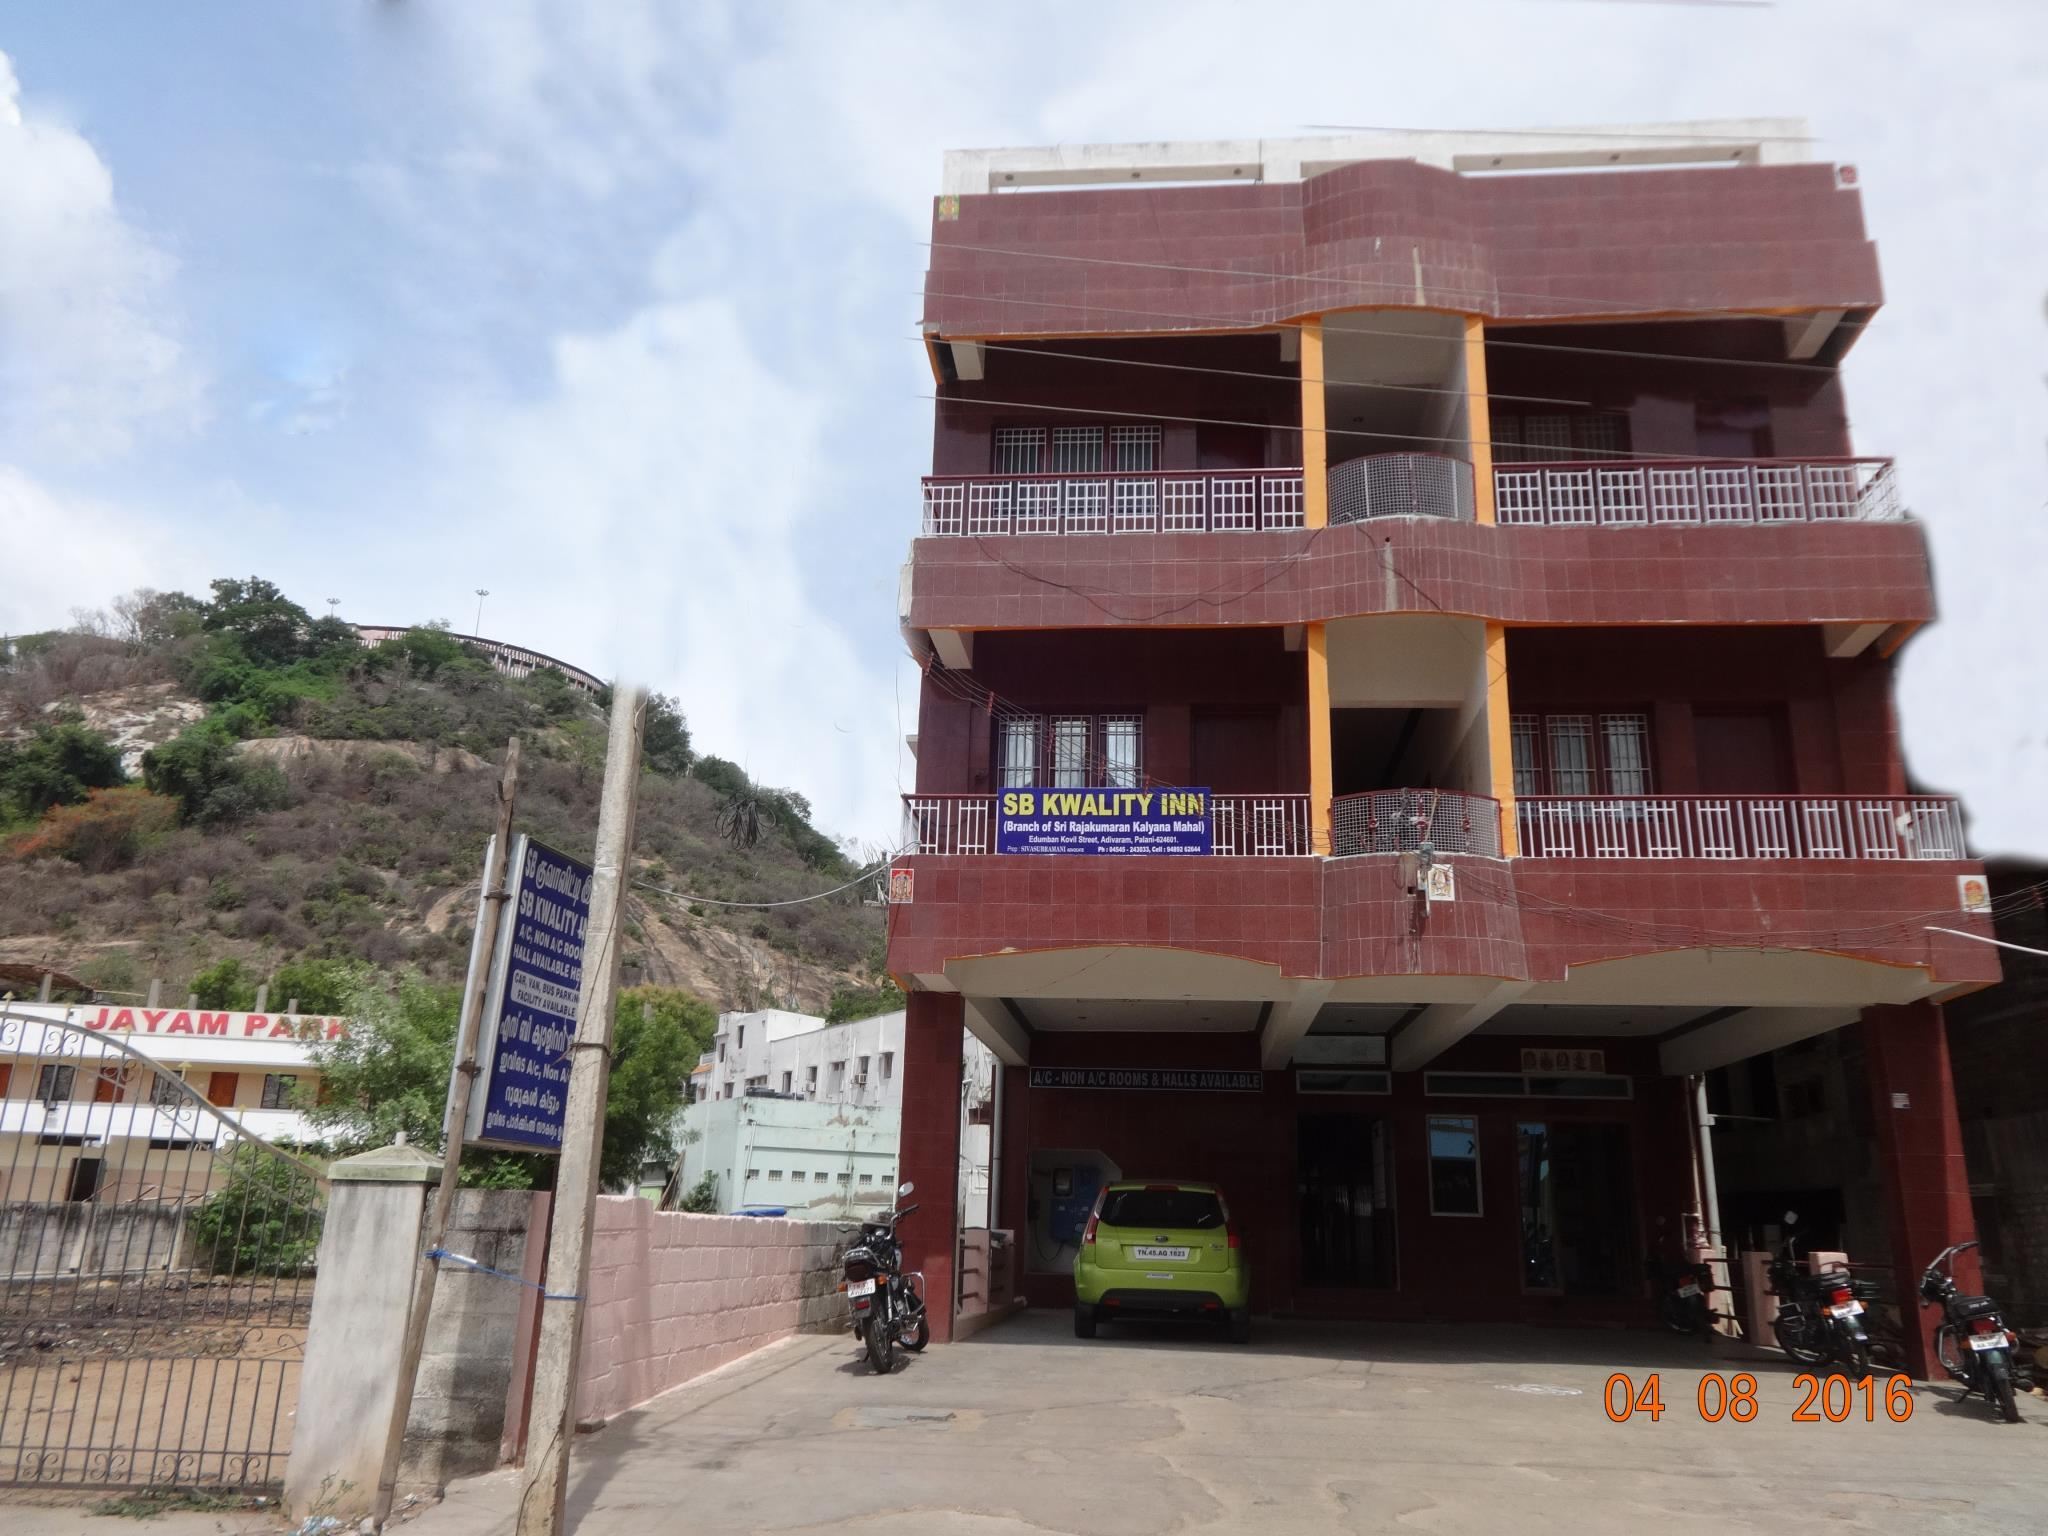 SB Kwality Inn   Cheap Hotels And Budget Hotels